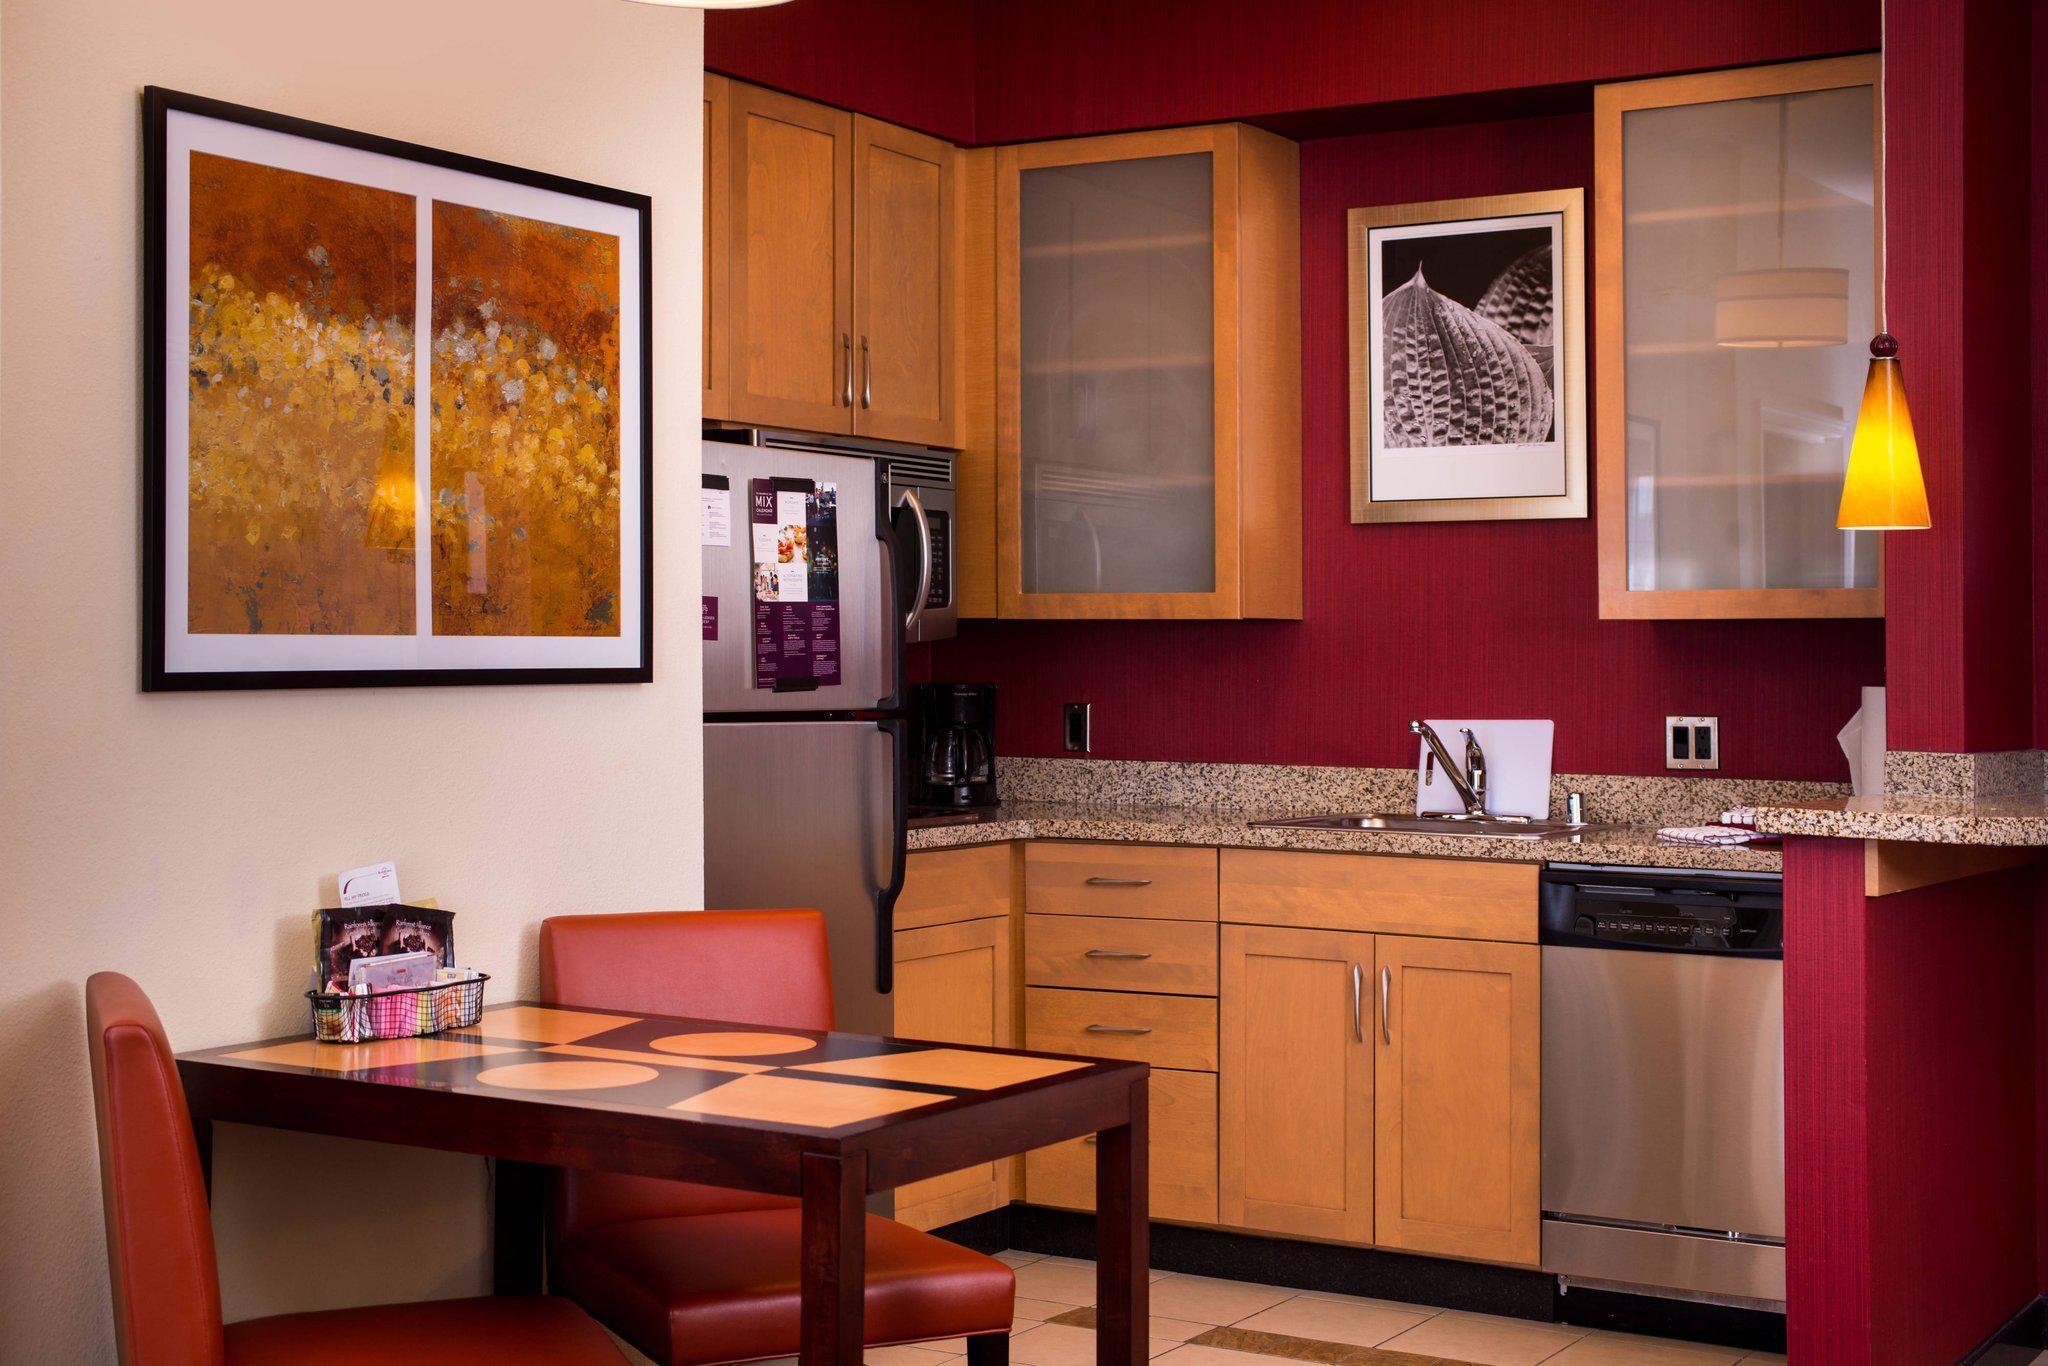 Residence Inn by Marriott Albuquerque Airport